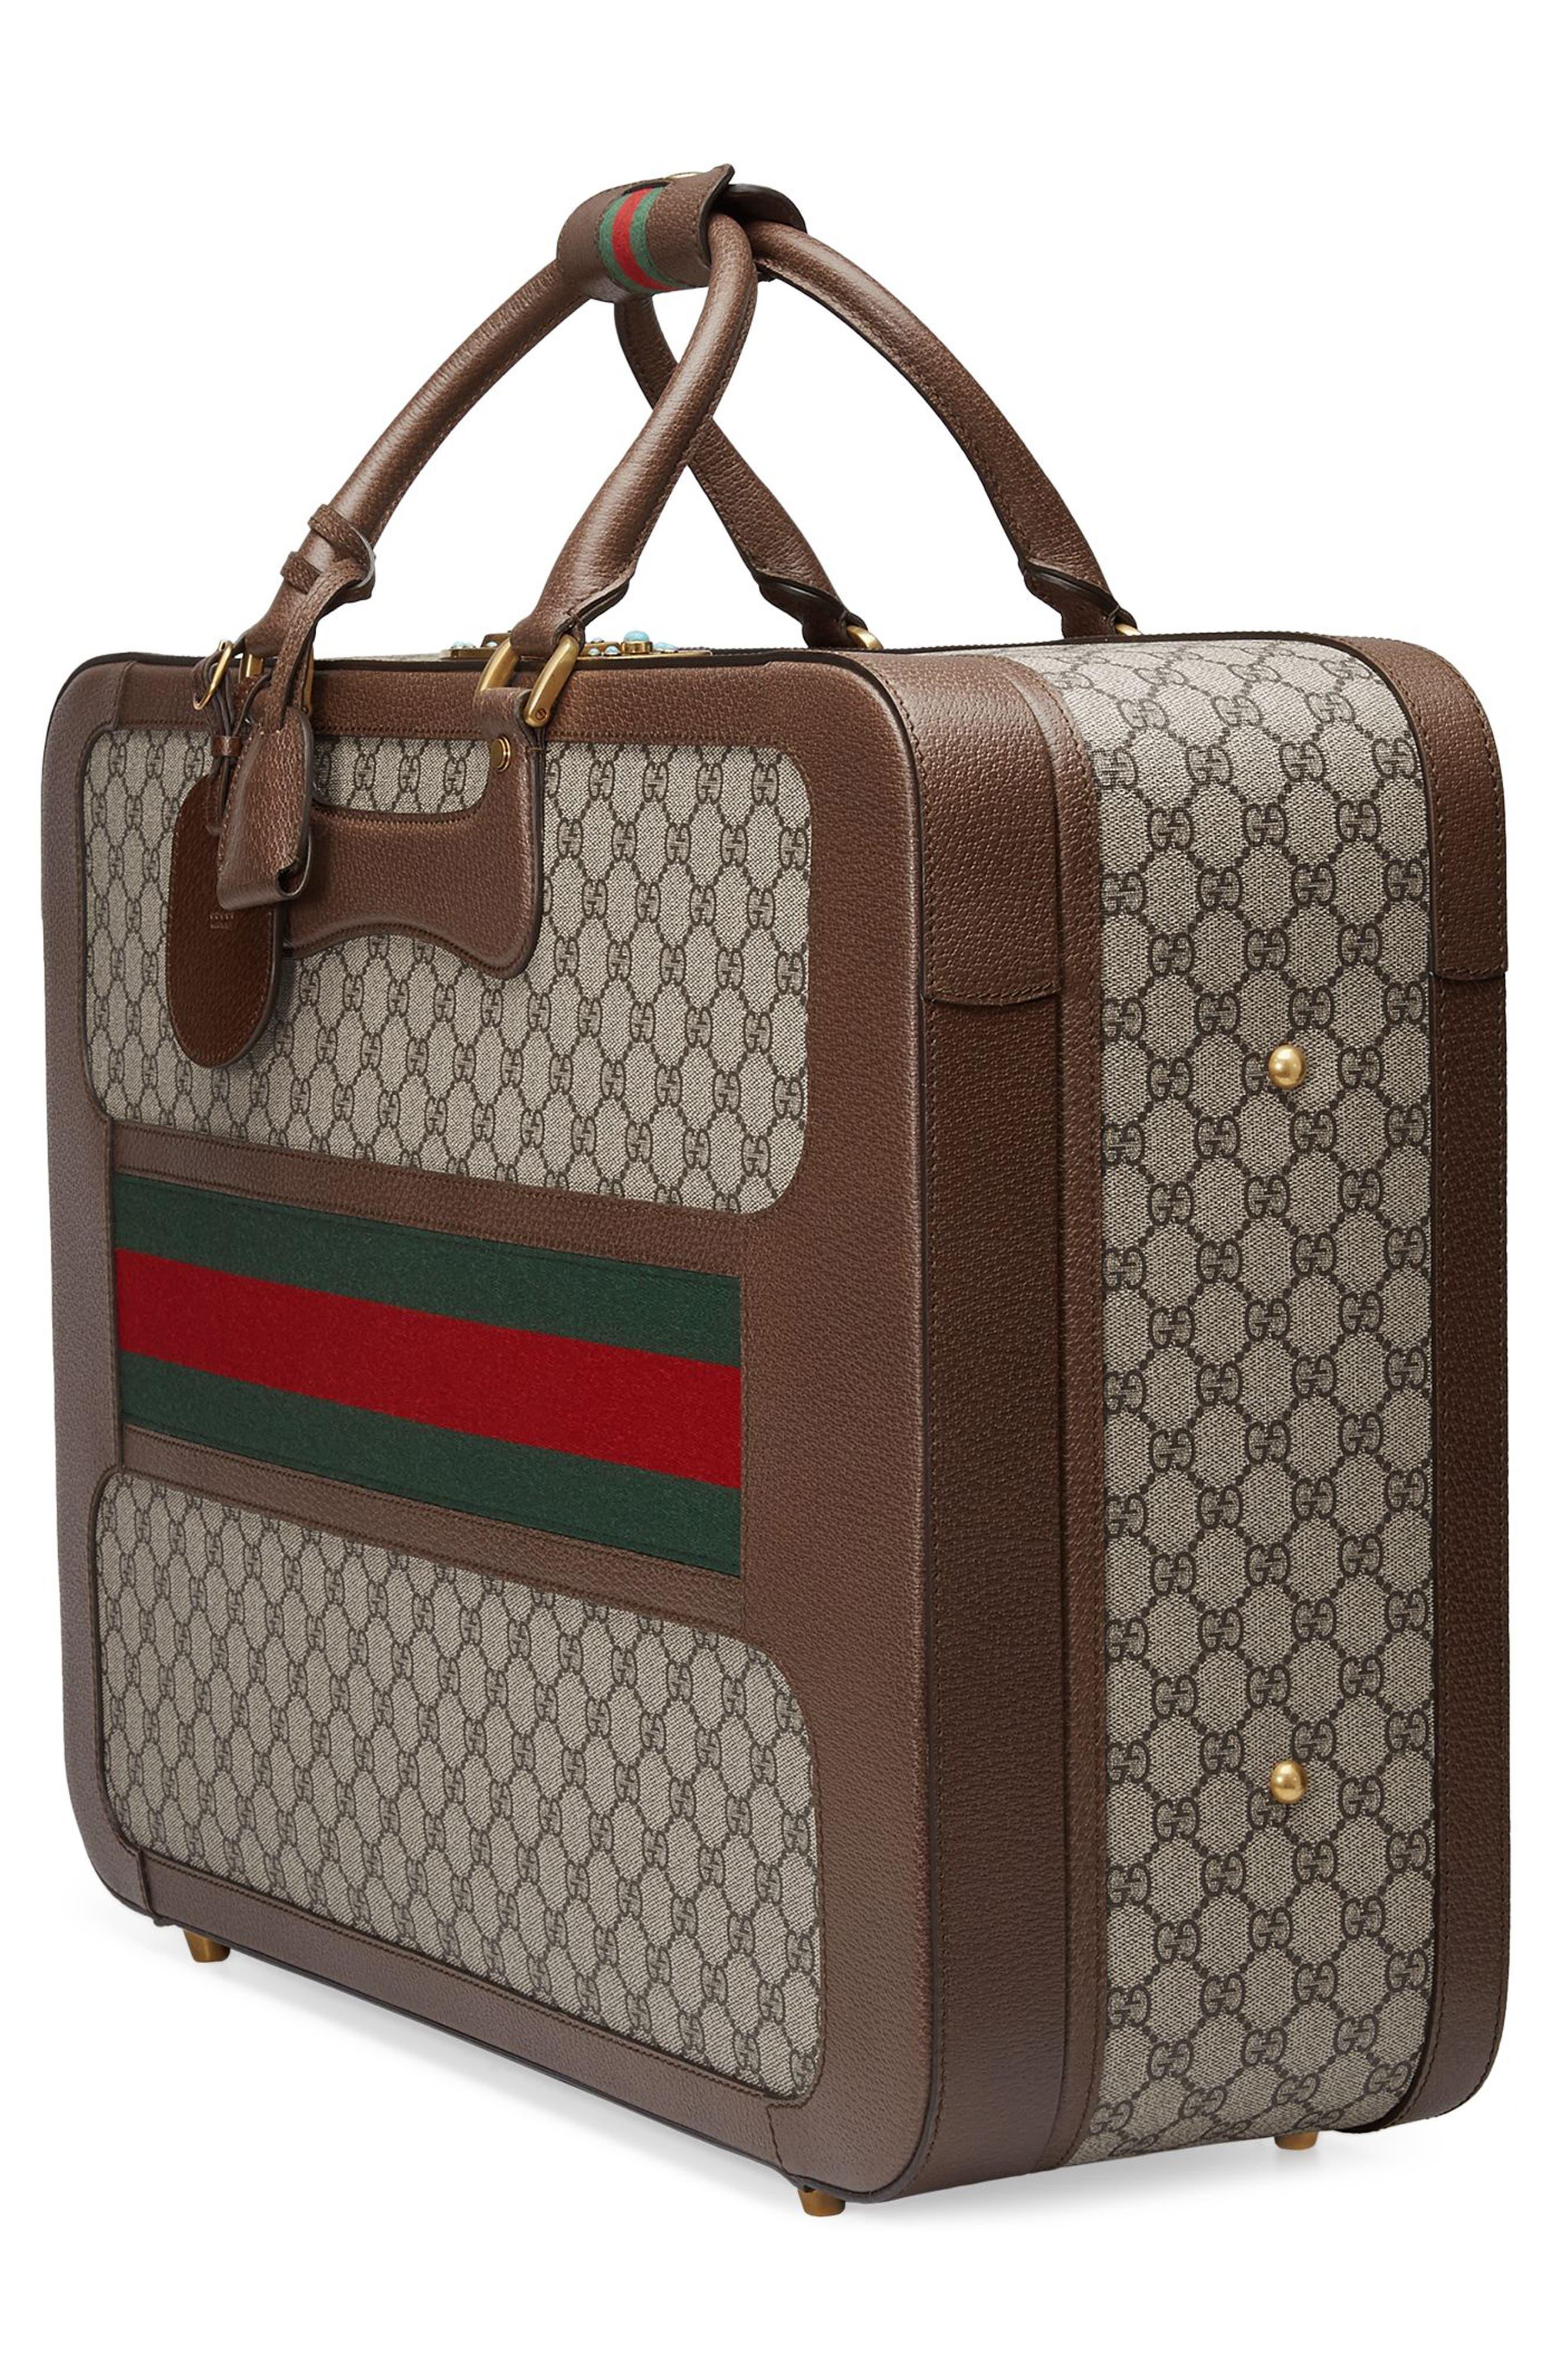 Large Echo GG Supreme Canvas & Leather Suitcase,                             Alternate thumbnail 4, color,                             Beige/ Ebony